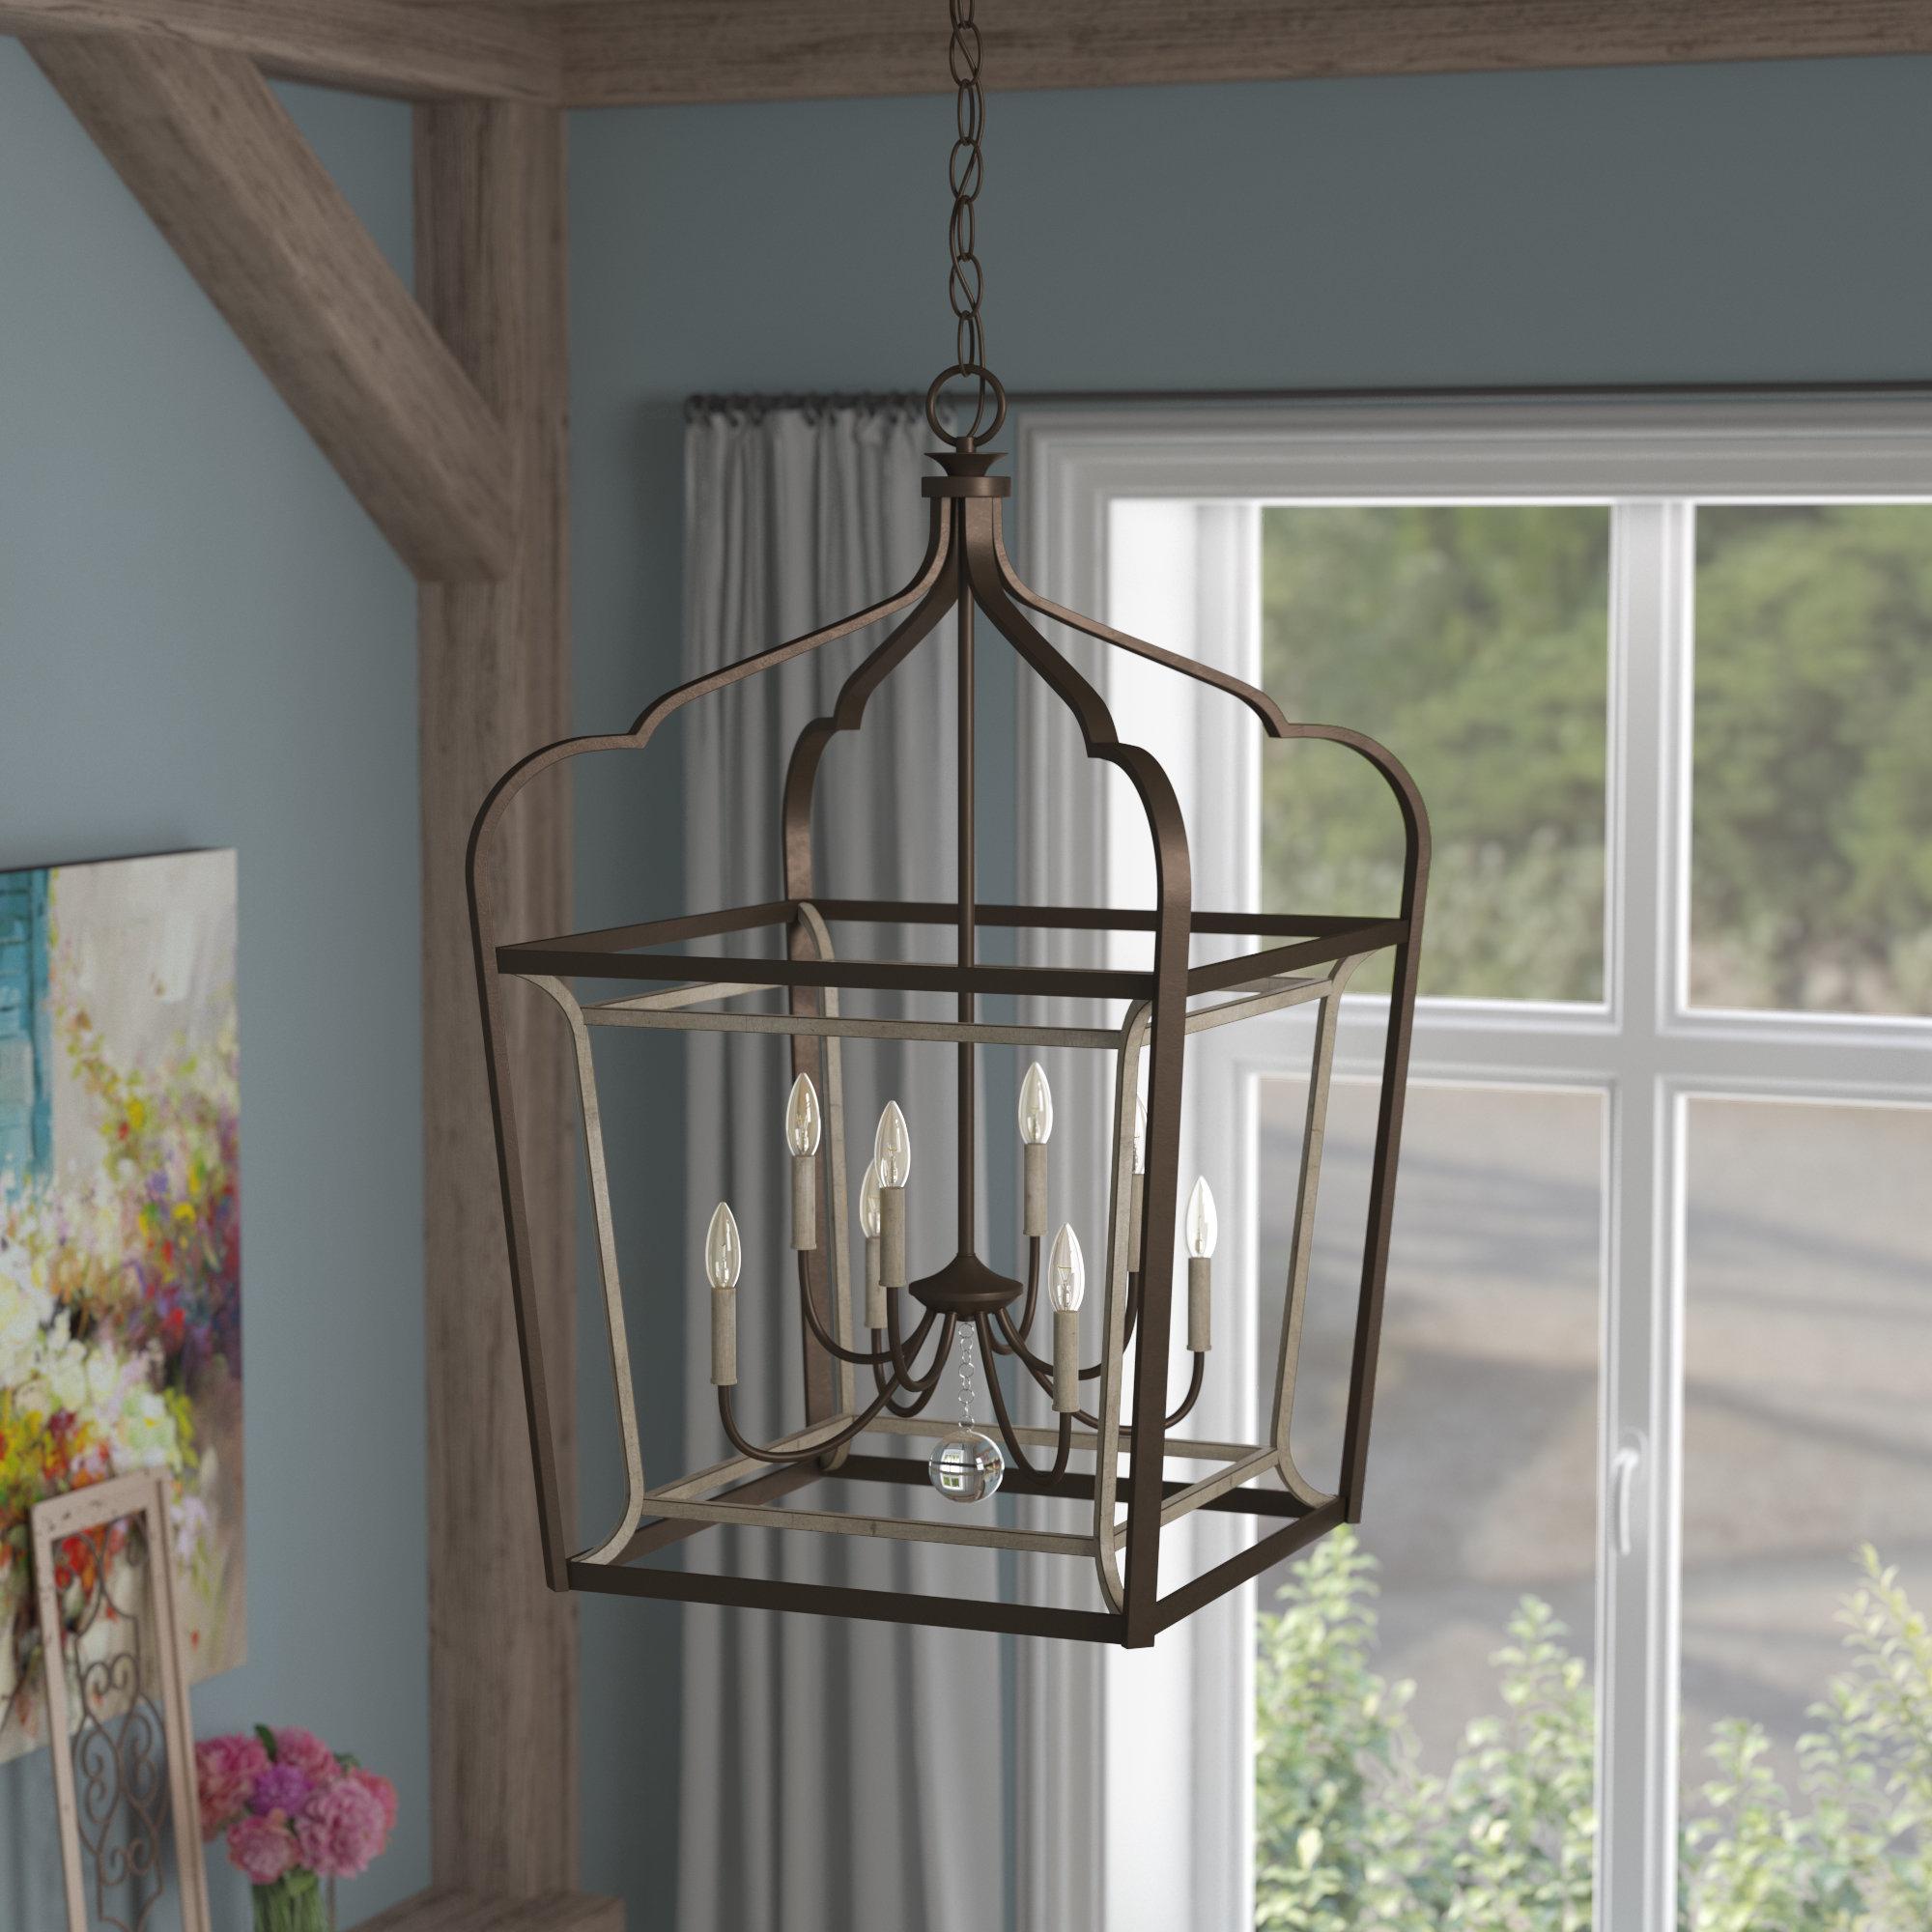 Evangeline 8 Light Lantern Geometric Pendant With Fashionable Carmen 8 Light Lantern Geometric Pendants (View 12 of 25)